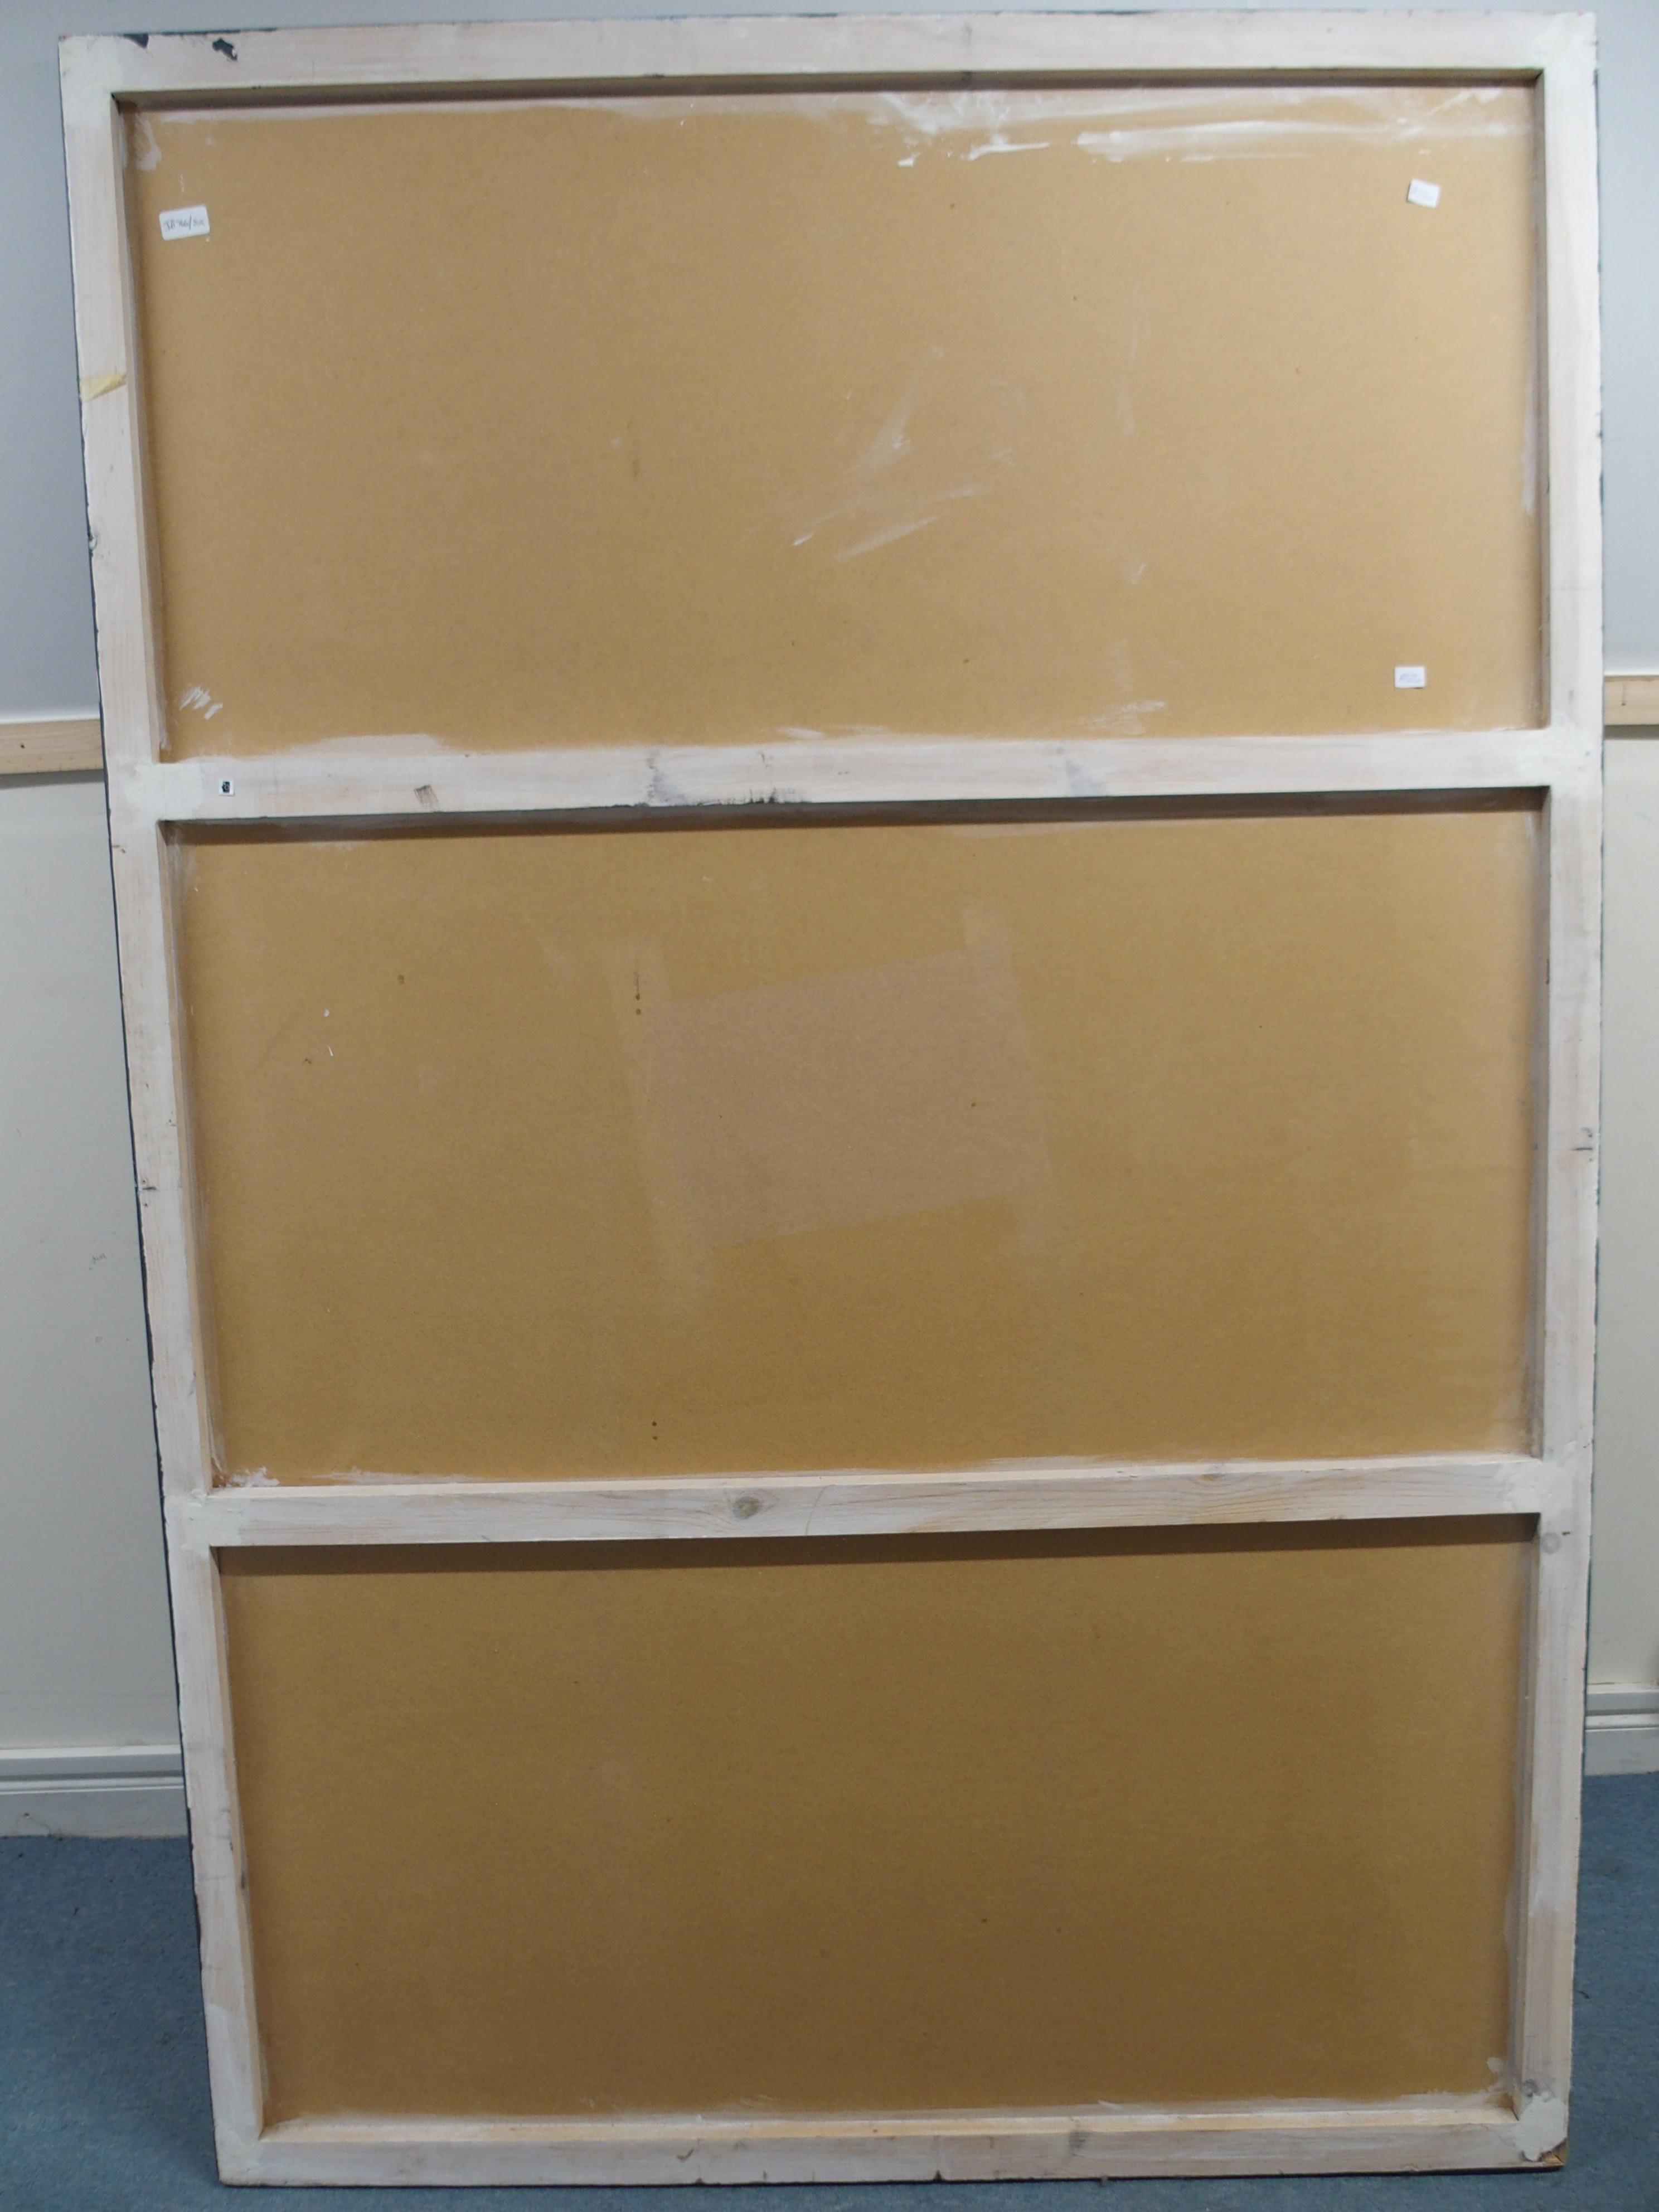 "•SEAN AMBROSE (SCOTTISH B. 1986) GENERATOR Oil on panel board, 183 x 122cm (72 x 48"") Exh. RSA 2010, - Image 3 of 3"